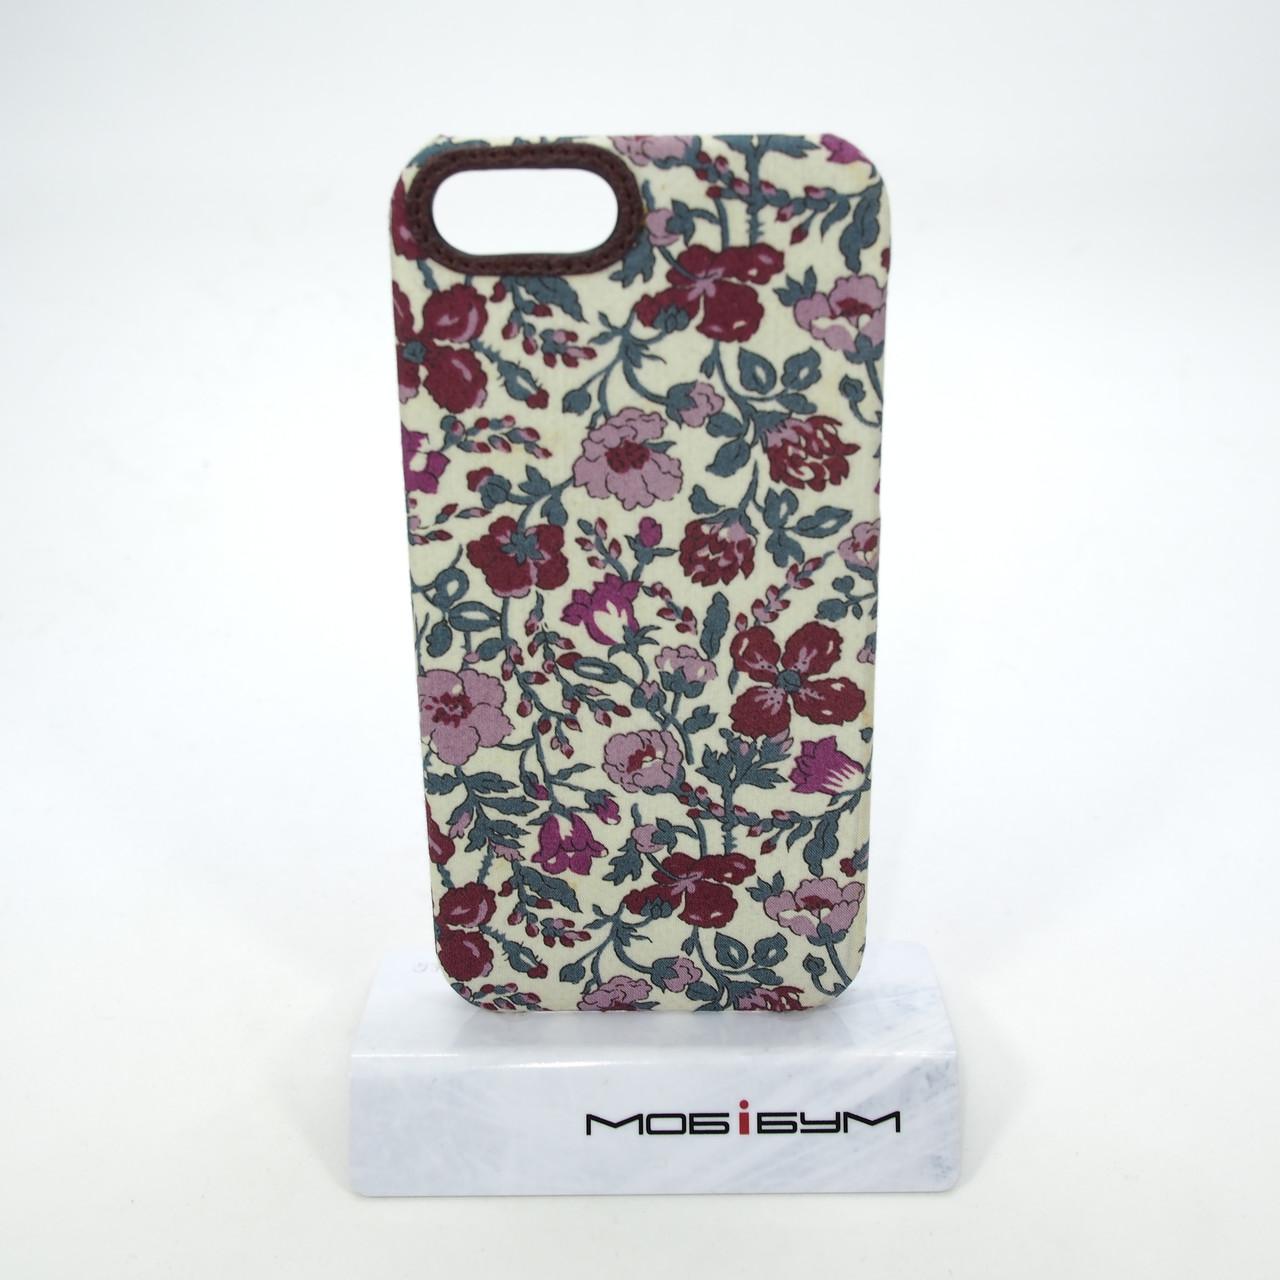 Чехол AVOC Liberty Bar iPhone 5s/SE violet/Meadow EAN/UPC: 8809387768228